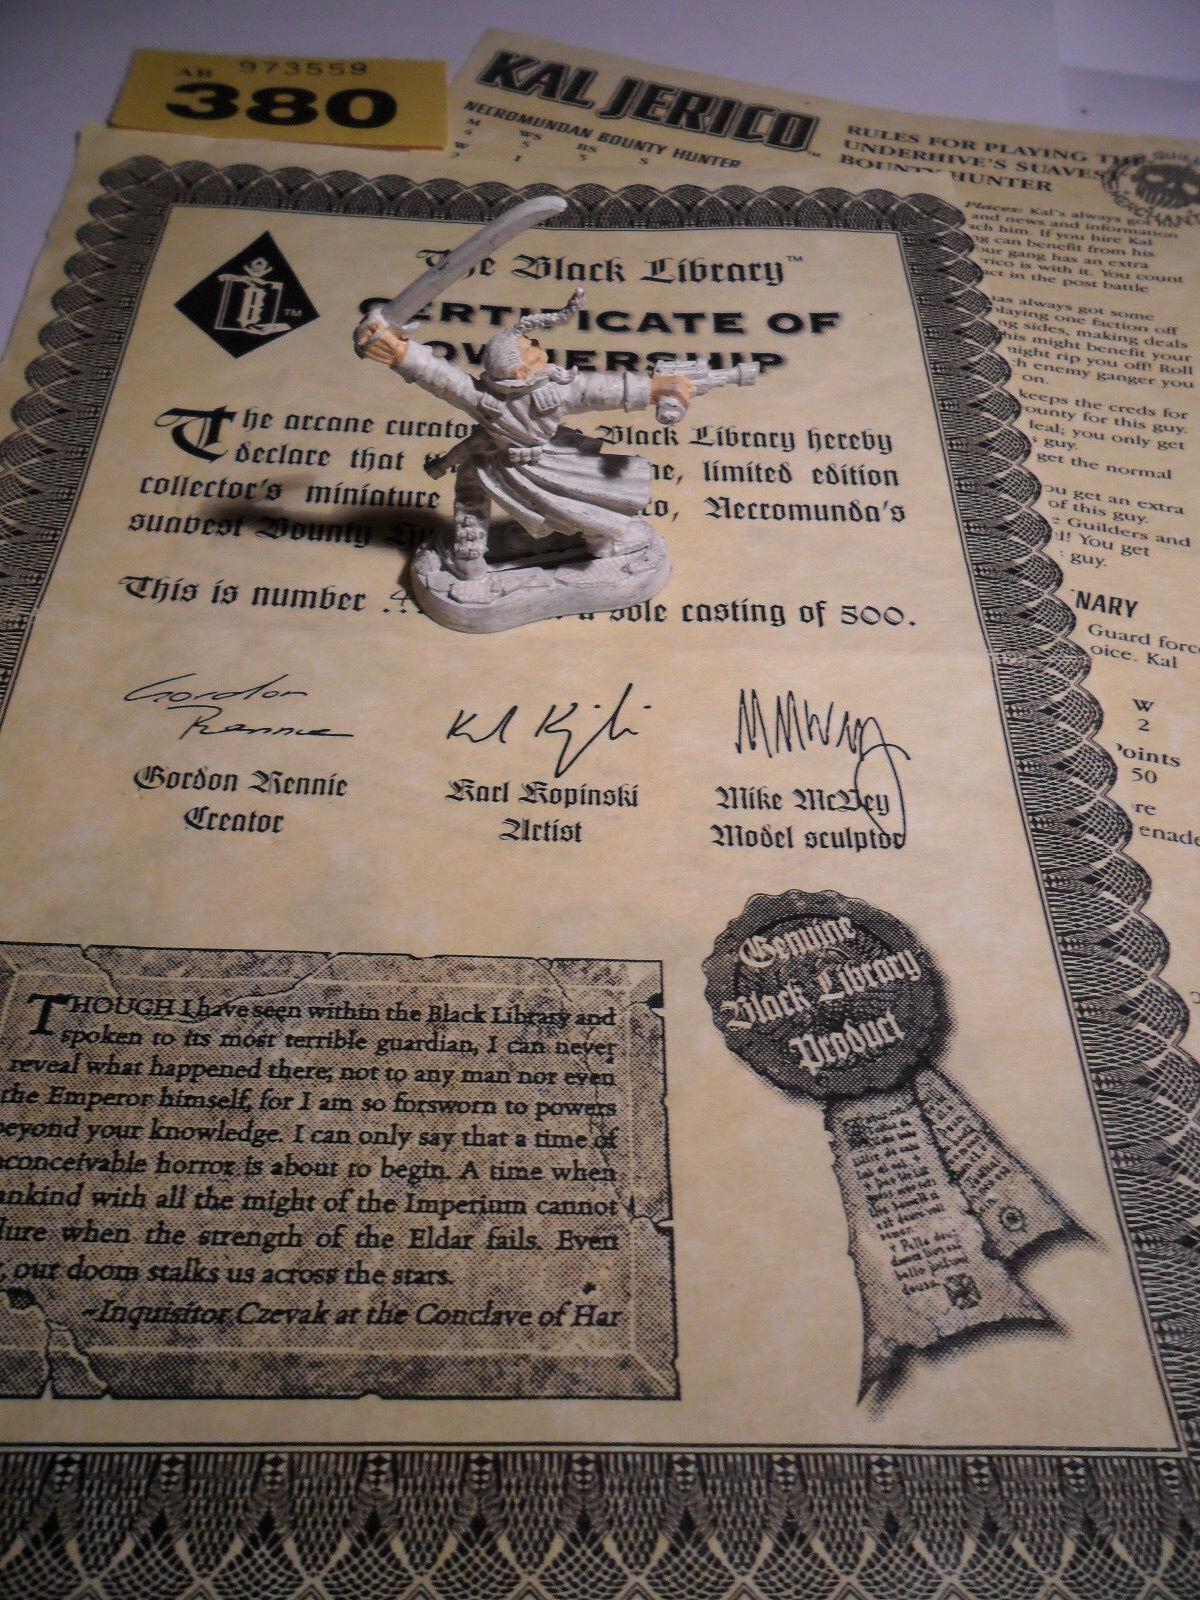 Warhammer 40k Necromunda Kal JERICO Negro Biblioteca limitada confirmó KOPINSKI Y380